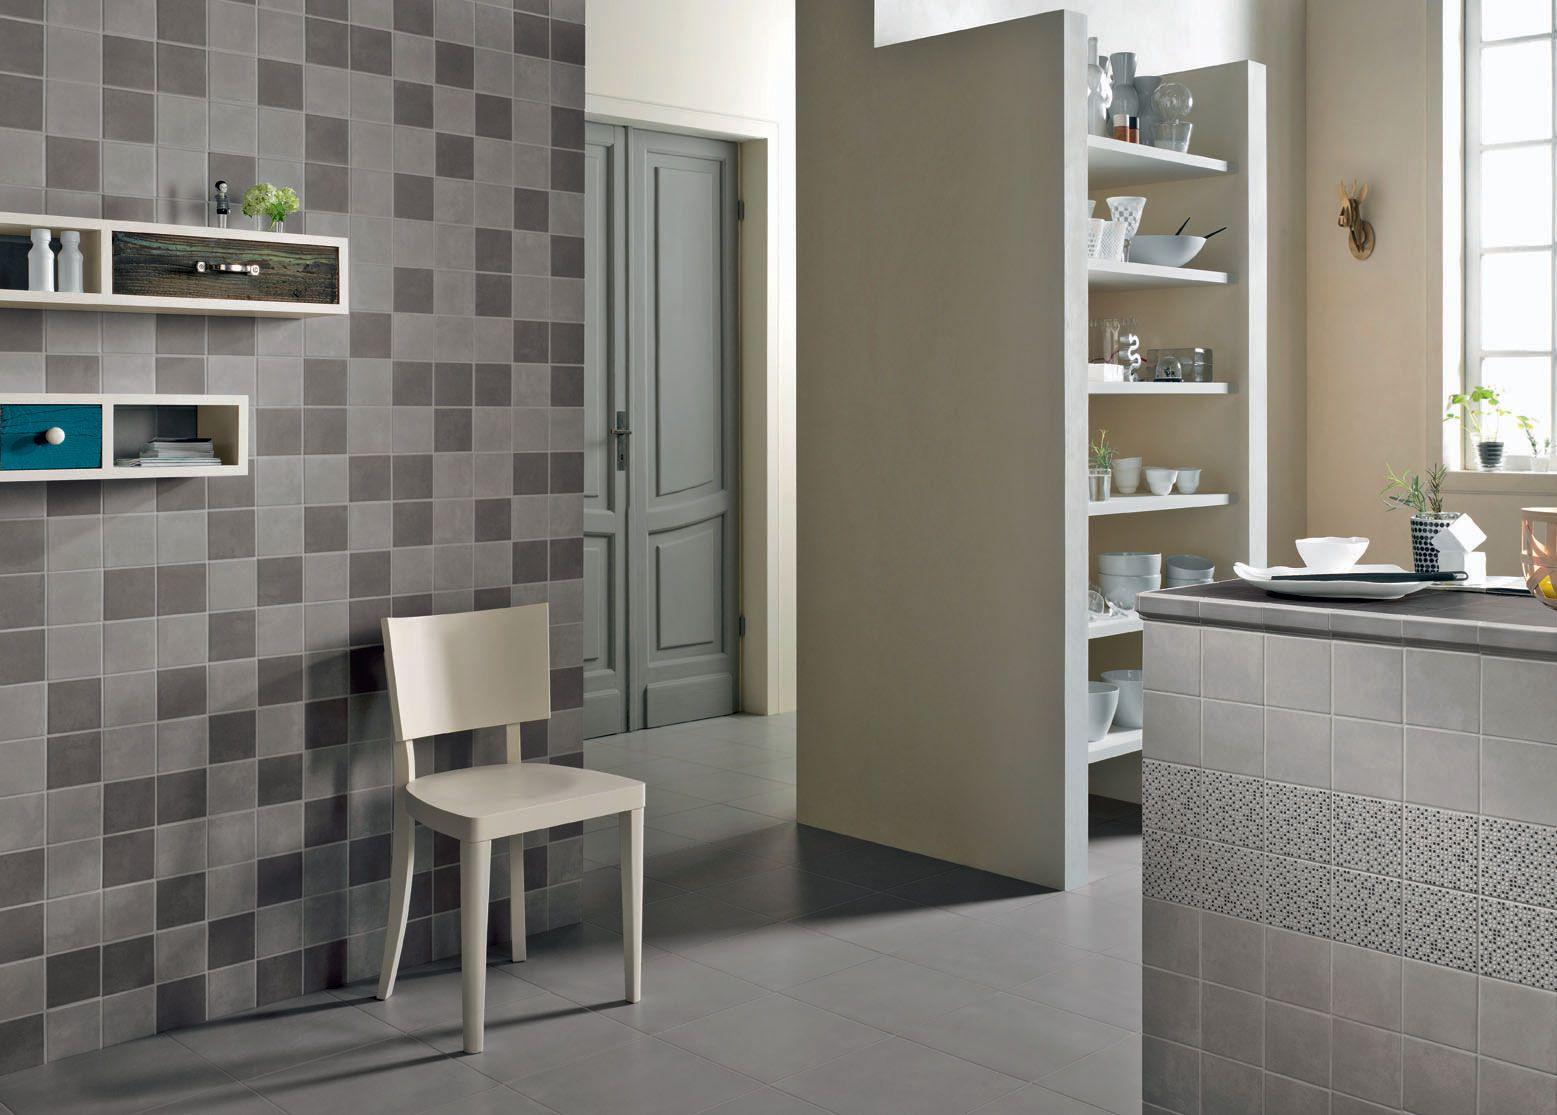 Kitchen Wall And Floor Tiles Progress Ceramic Tiles For Kitchen Marazzi Marazzi